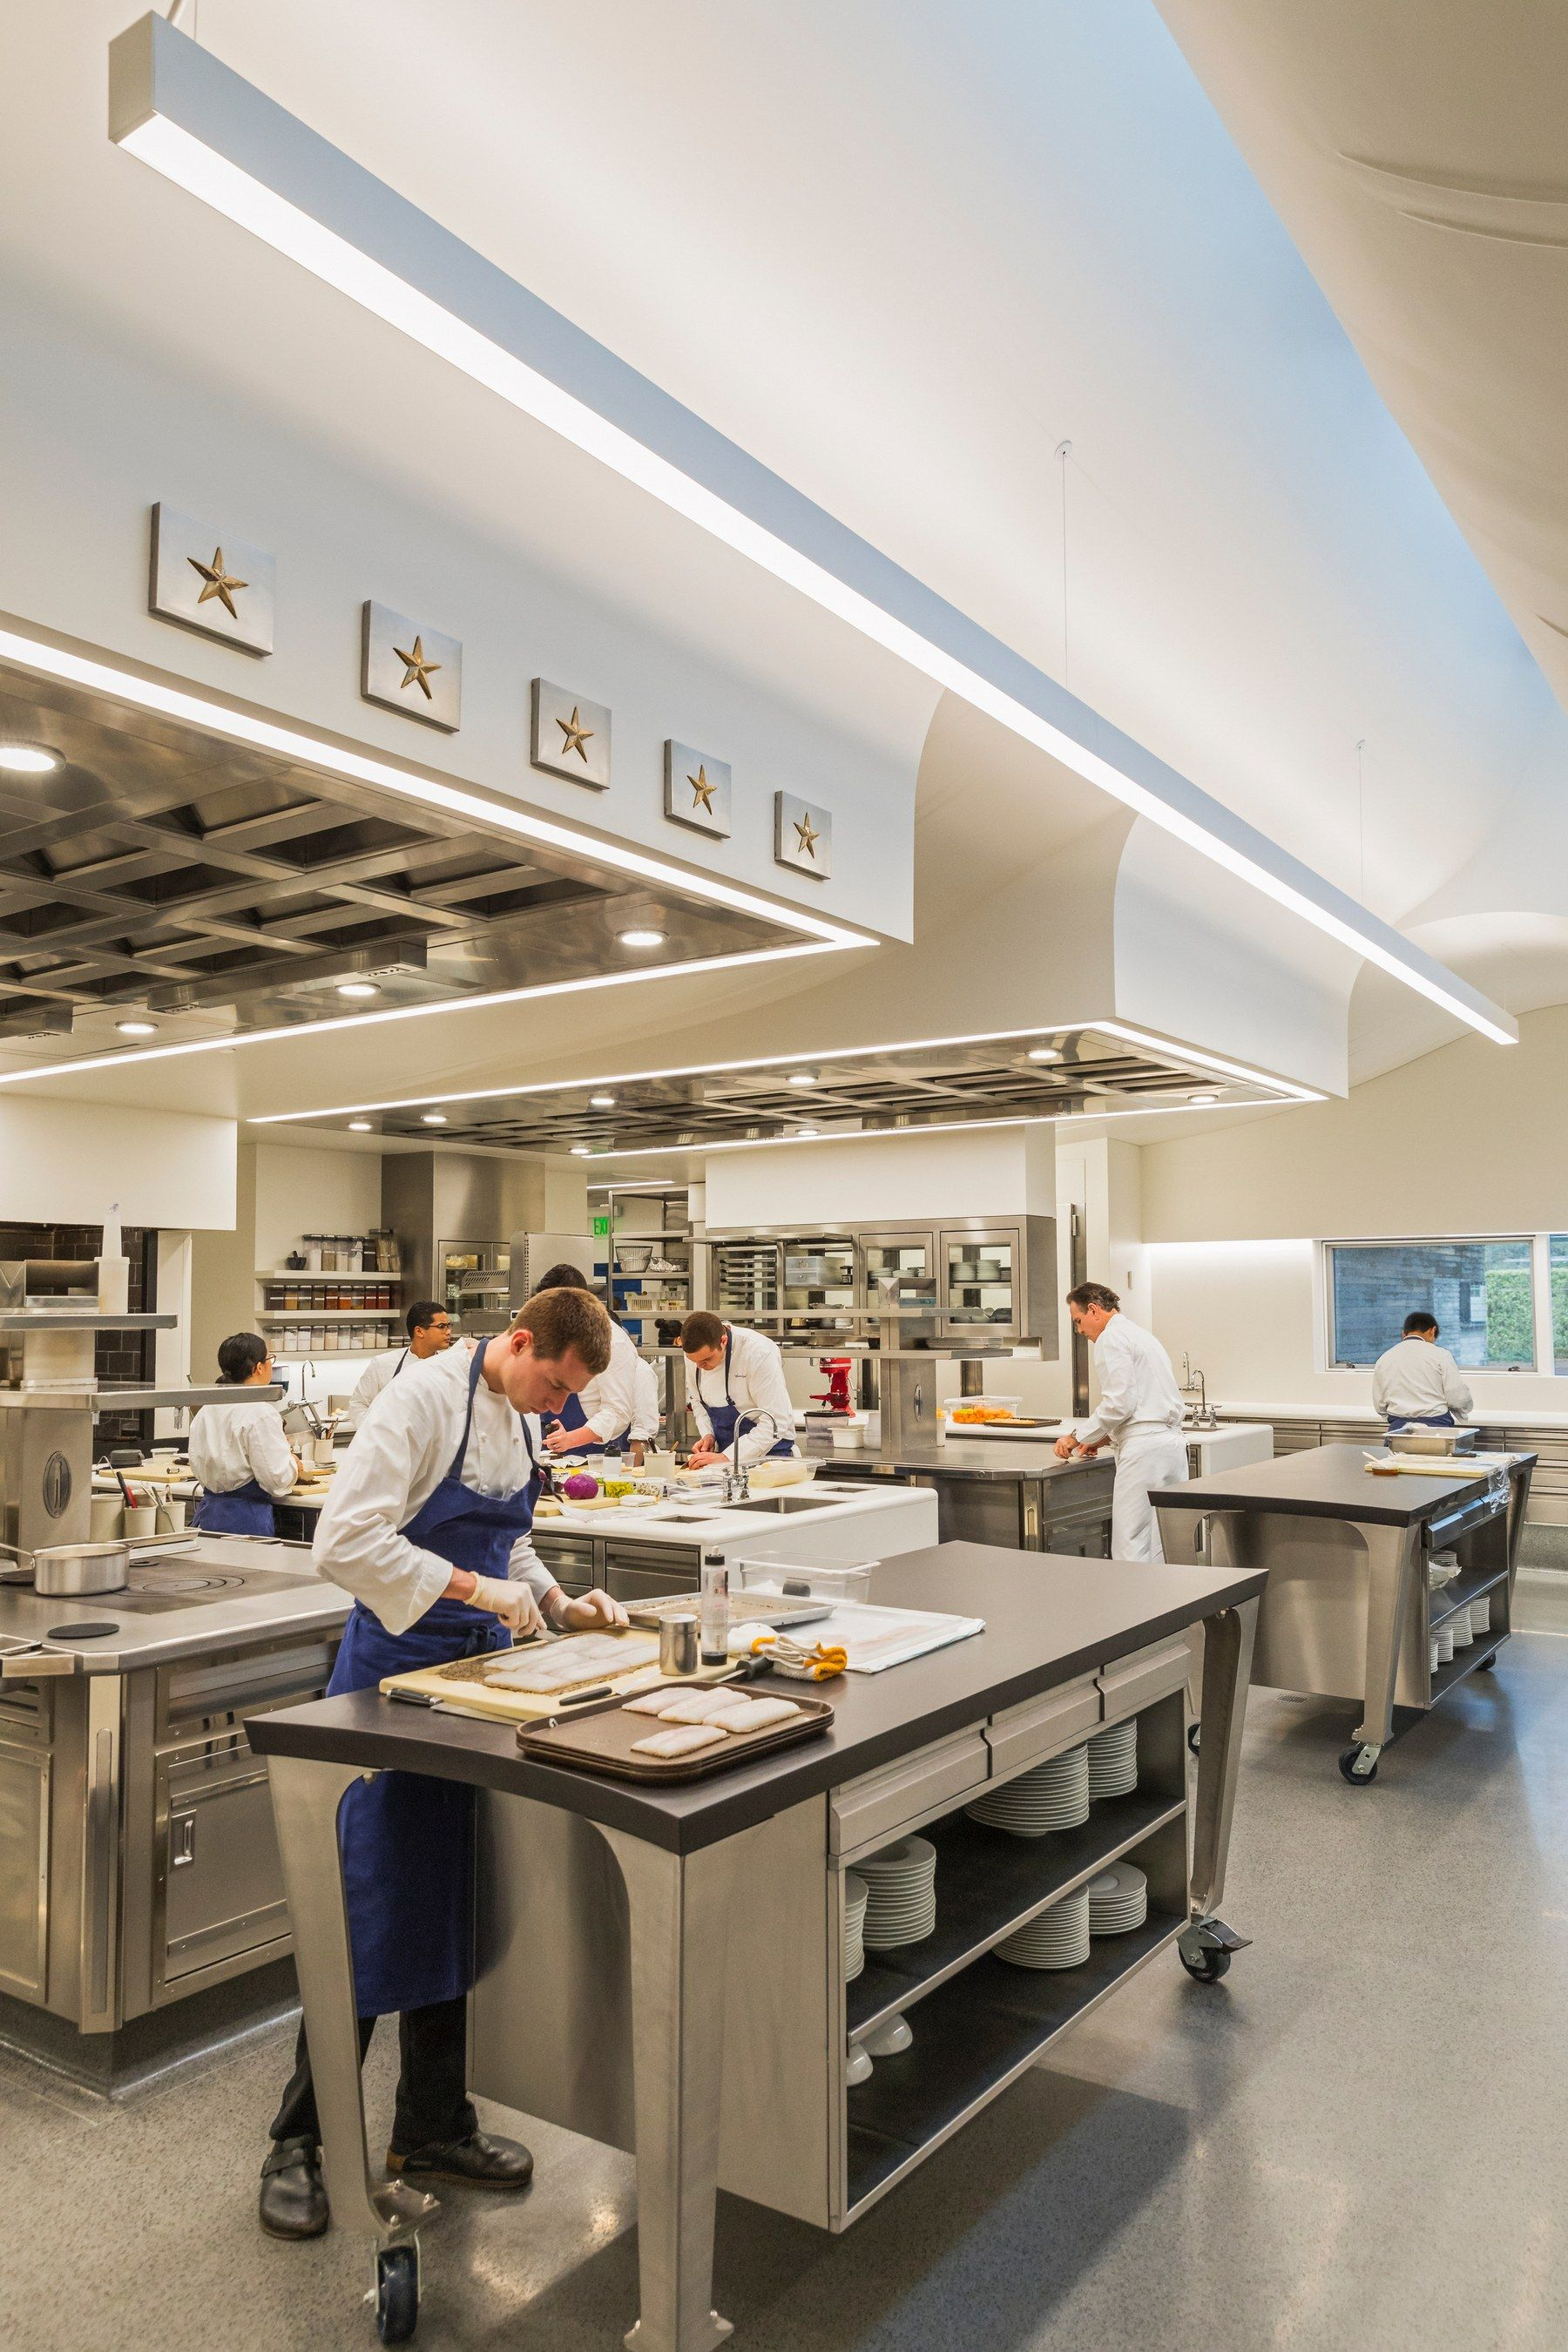 Look Inside The French Laundry S Stunning New Kitchen By Snohetta Restaurant Kitchen Design Commercial Kitchen Design Kitchen Layout